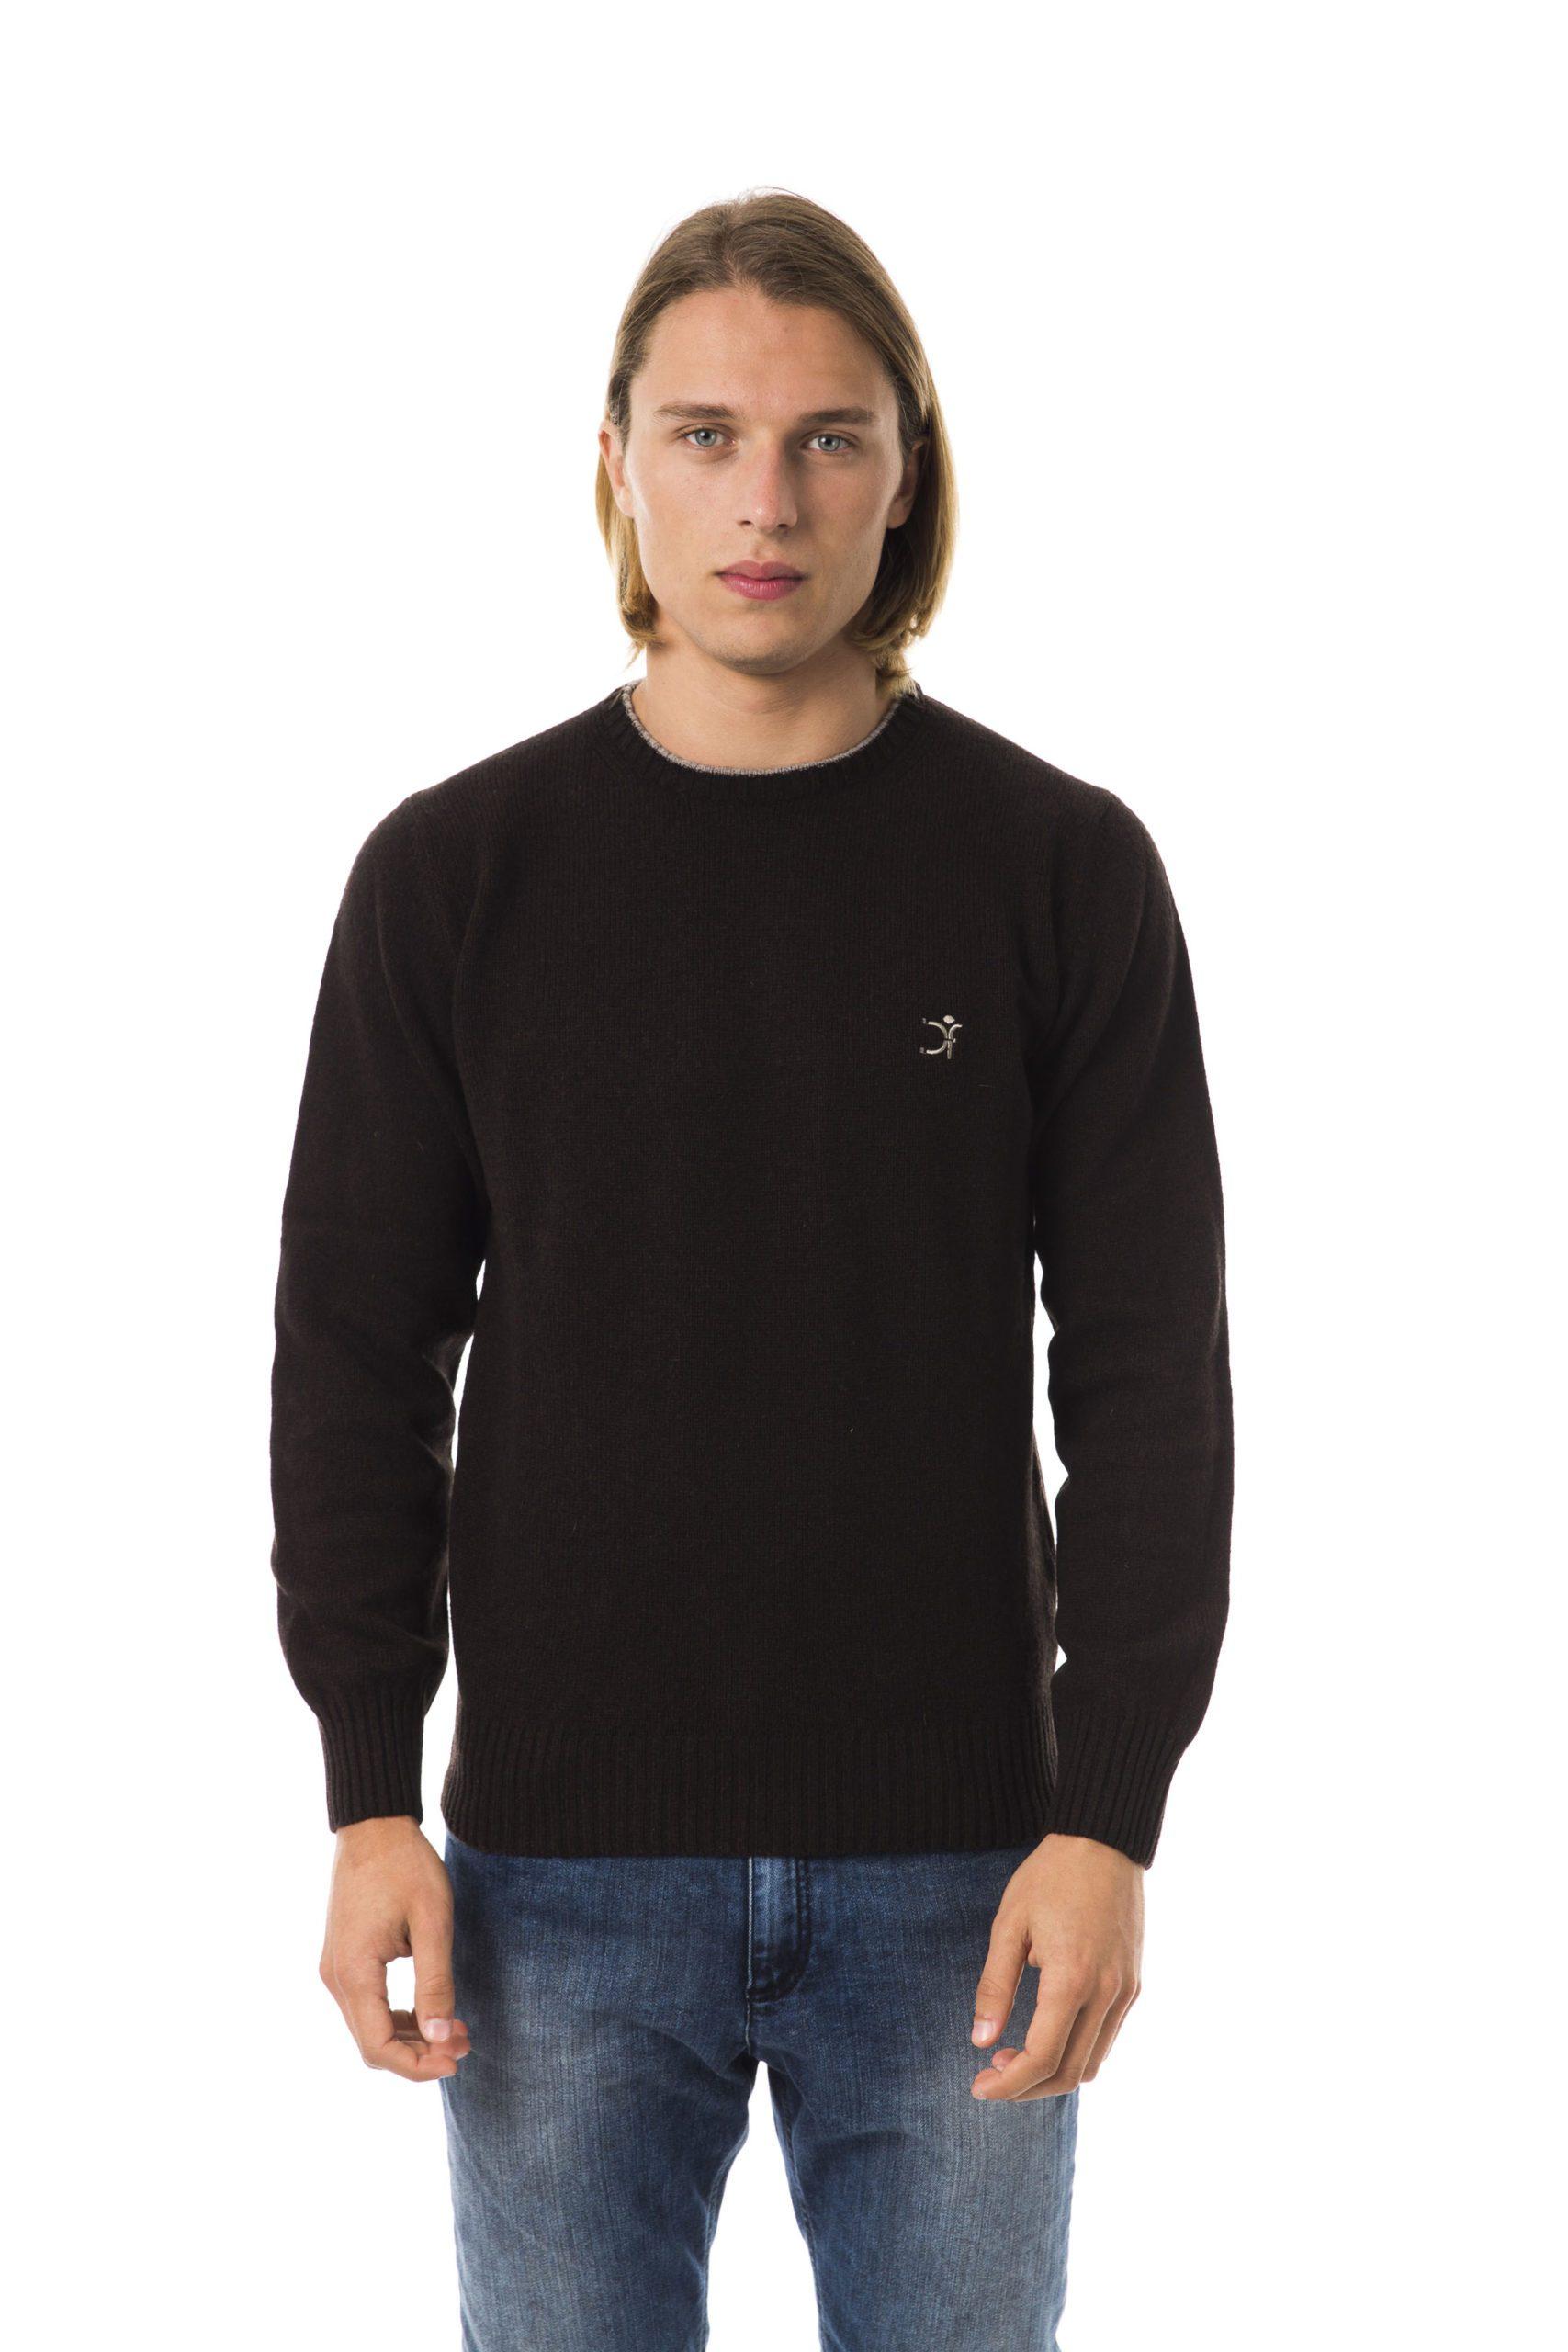 Uominitaliani Men's Moro Sweater Brown UO816583 - S